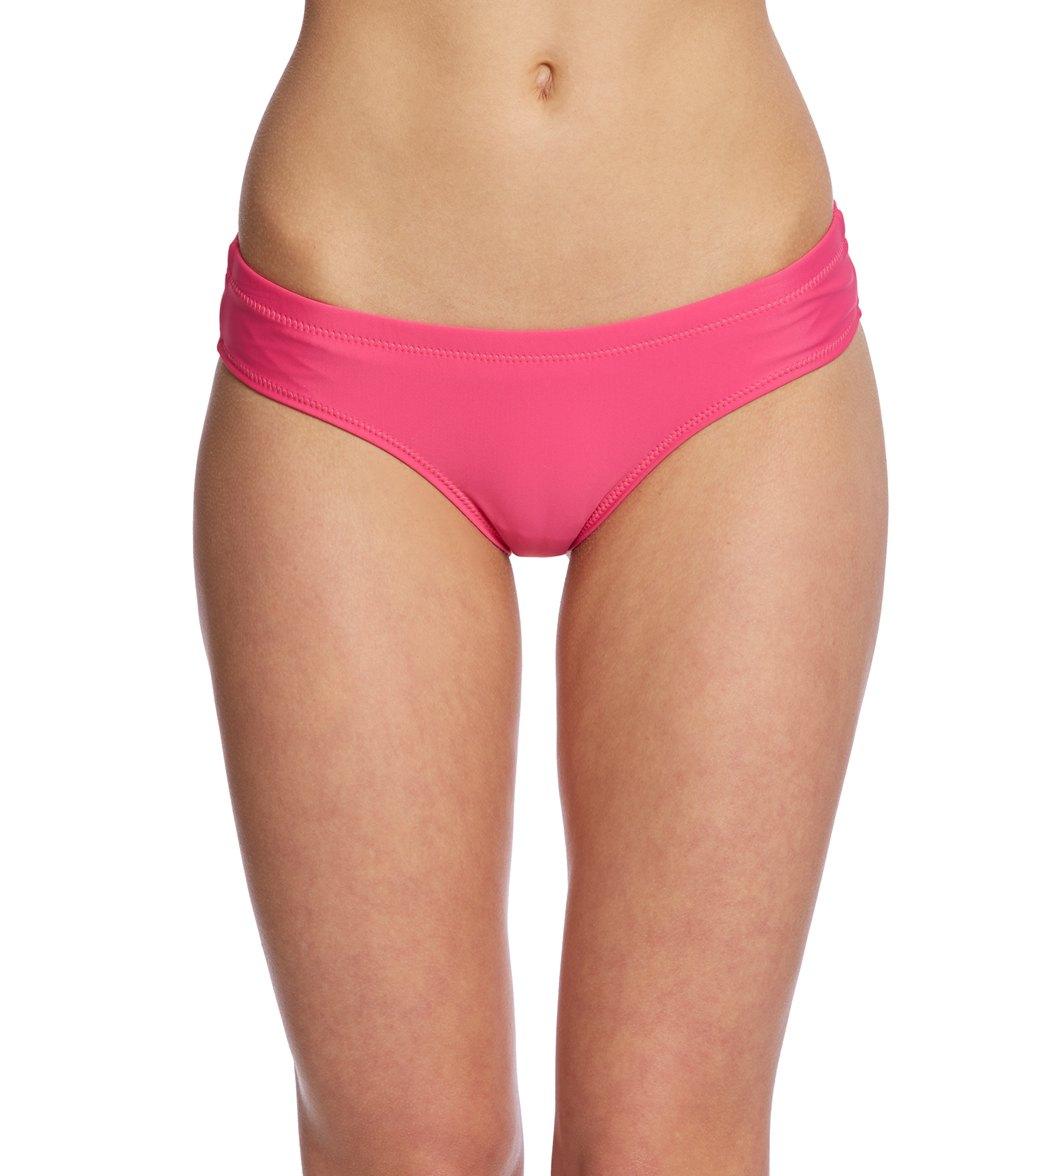 fd3af4c0557 Volcom Simply Solid Cheeky Bikini Bottom at SwimOutlet.com